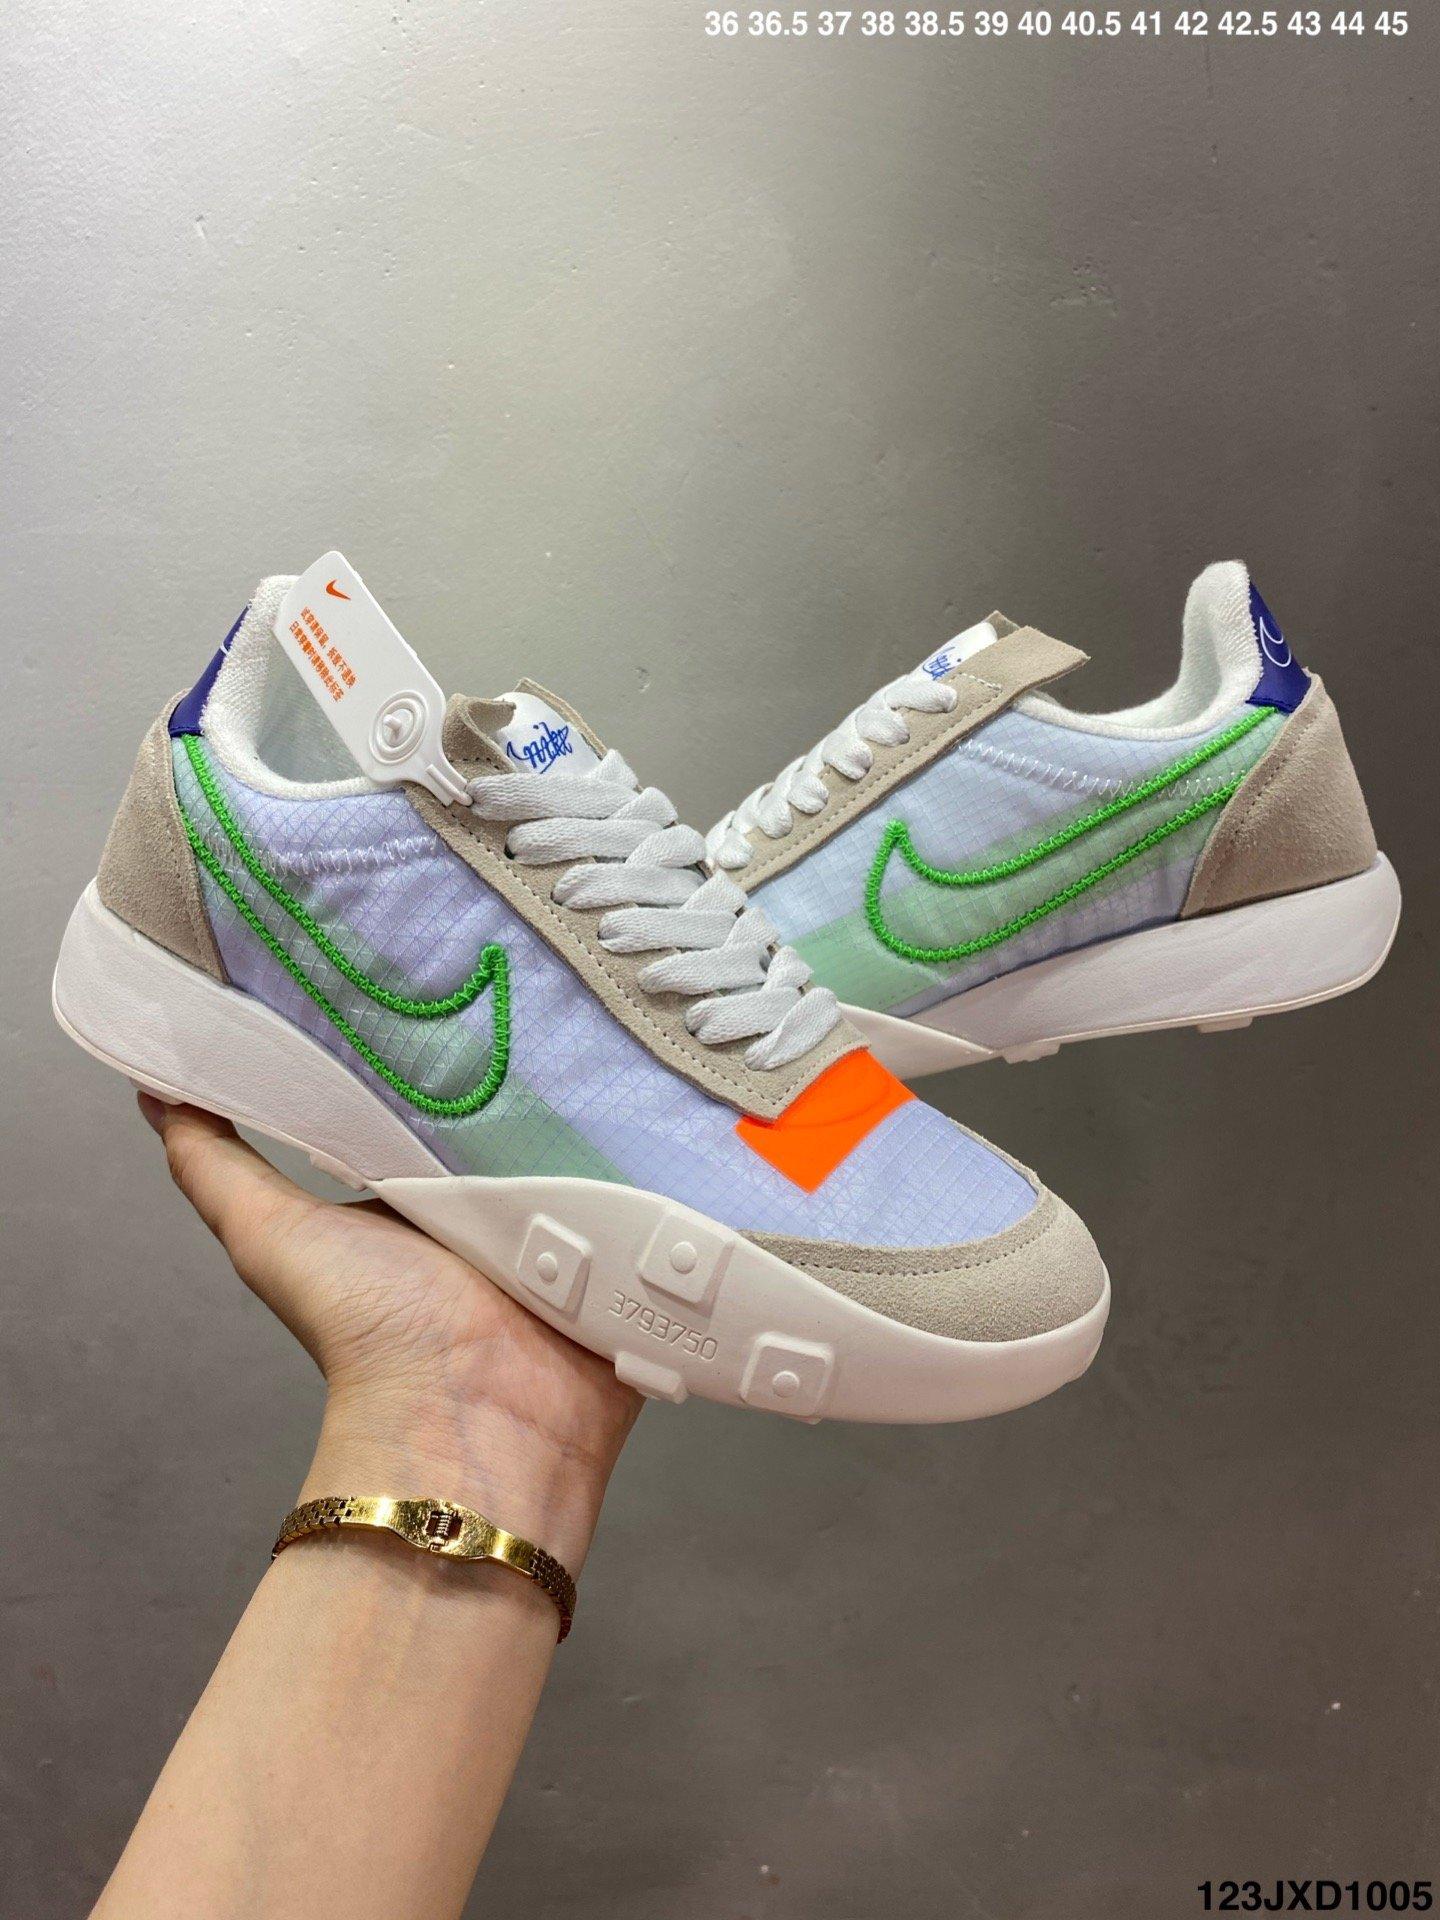 05104728529 - 运动鞋, 跑步鞋, Swoosh, Racer, Nike Waffle Racer 2X